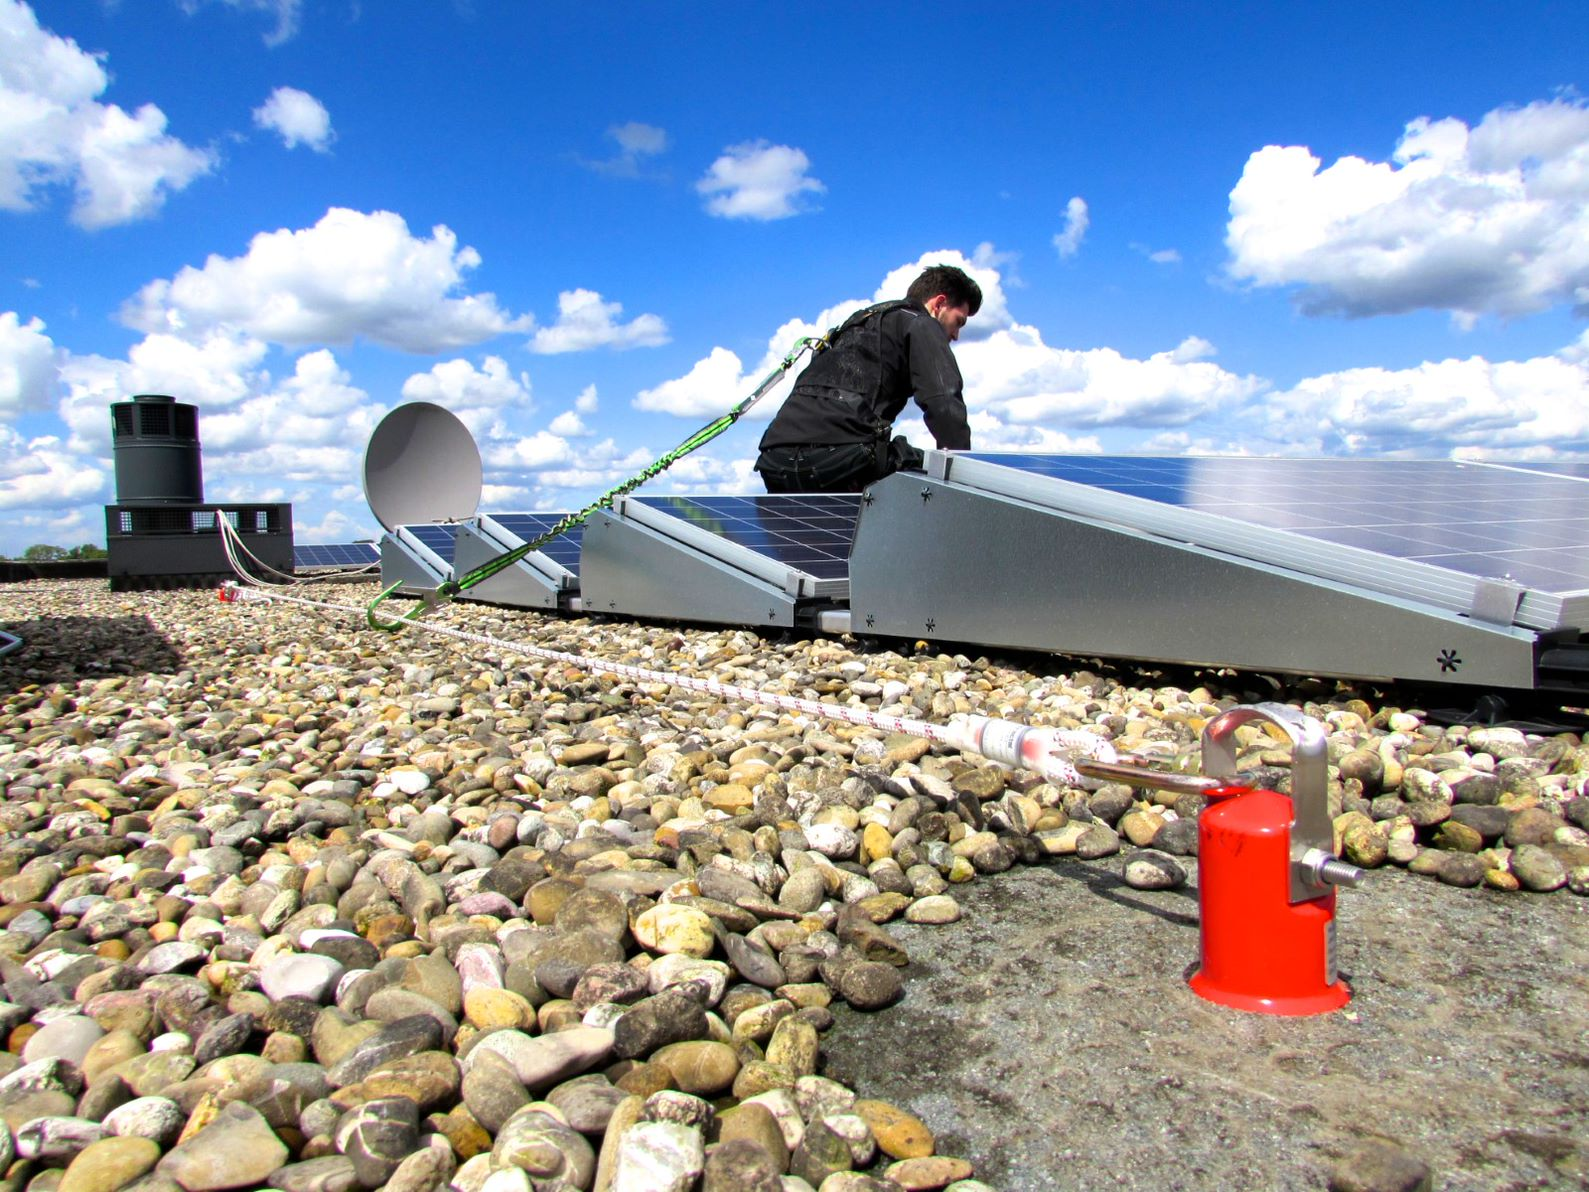 valbeveiliging montage zonnepanelen